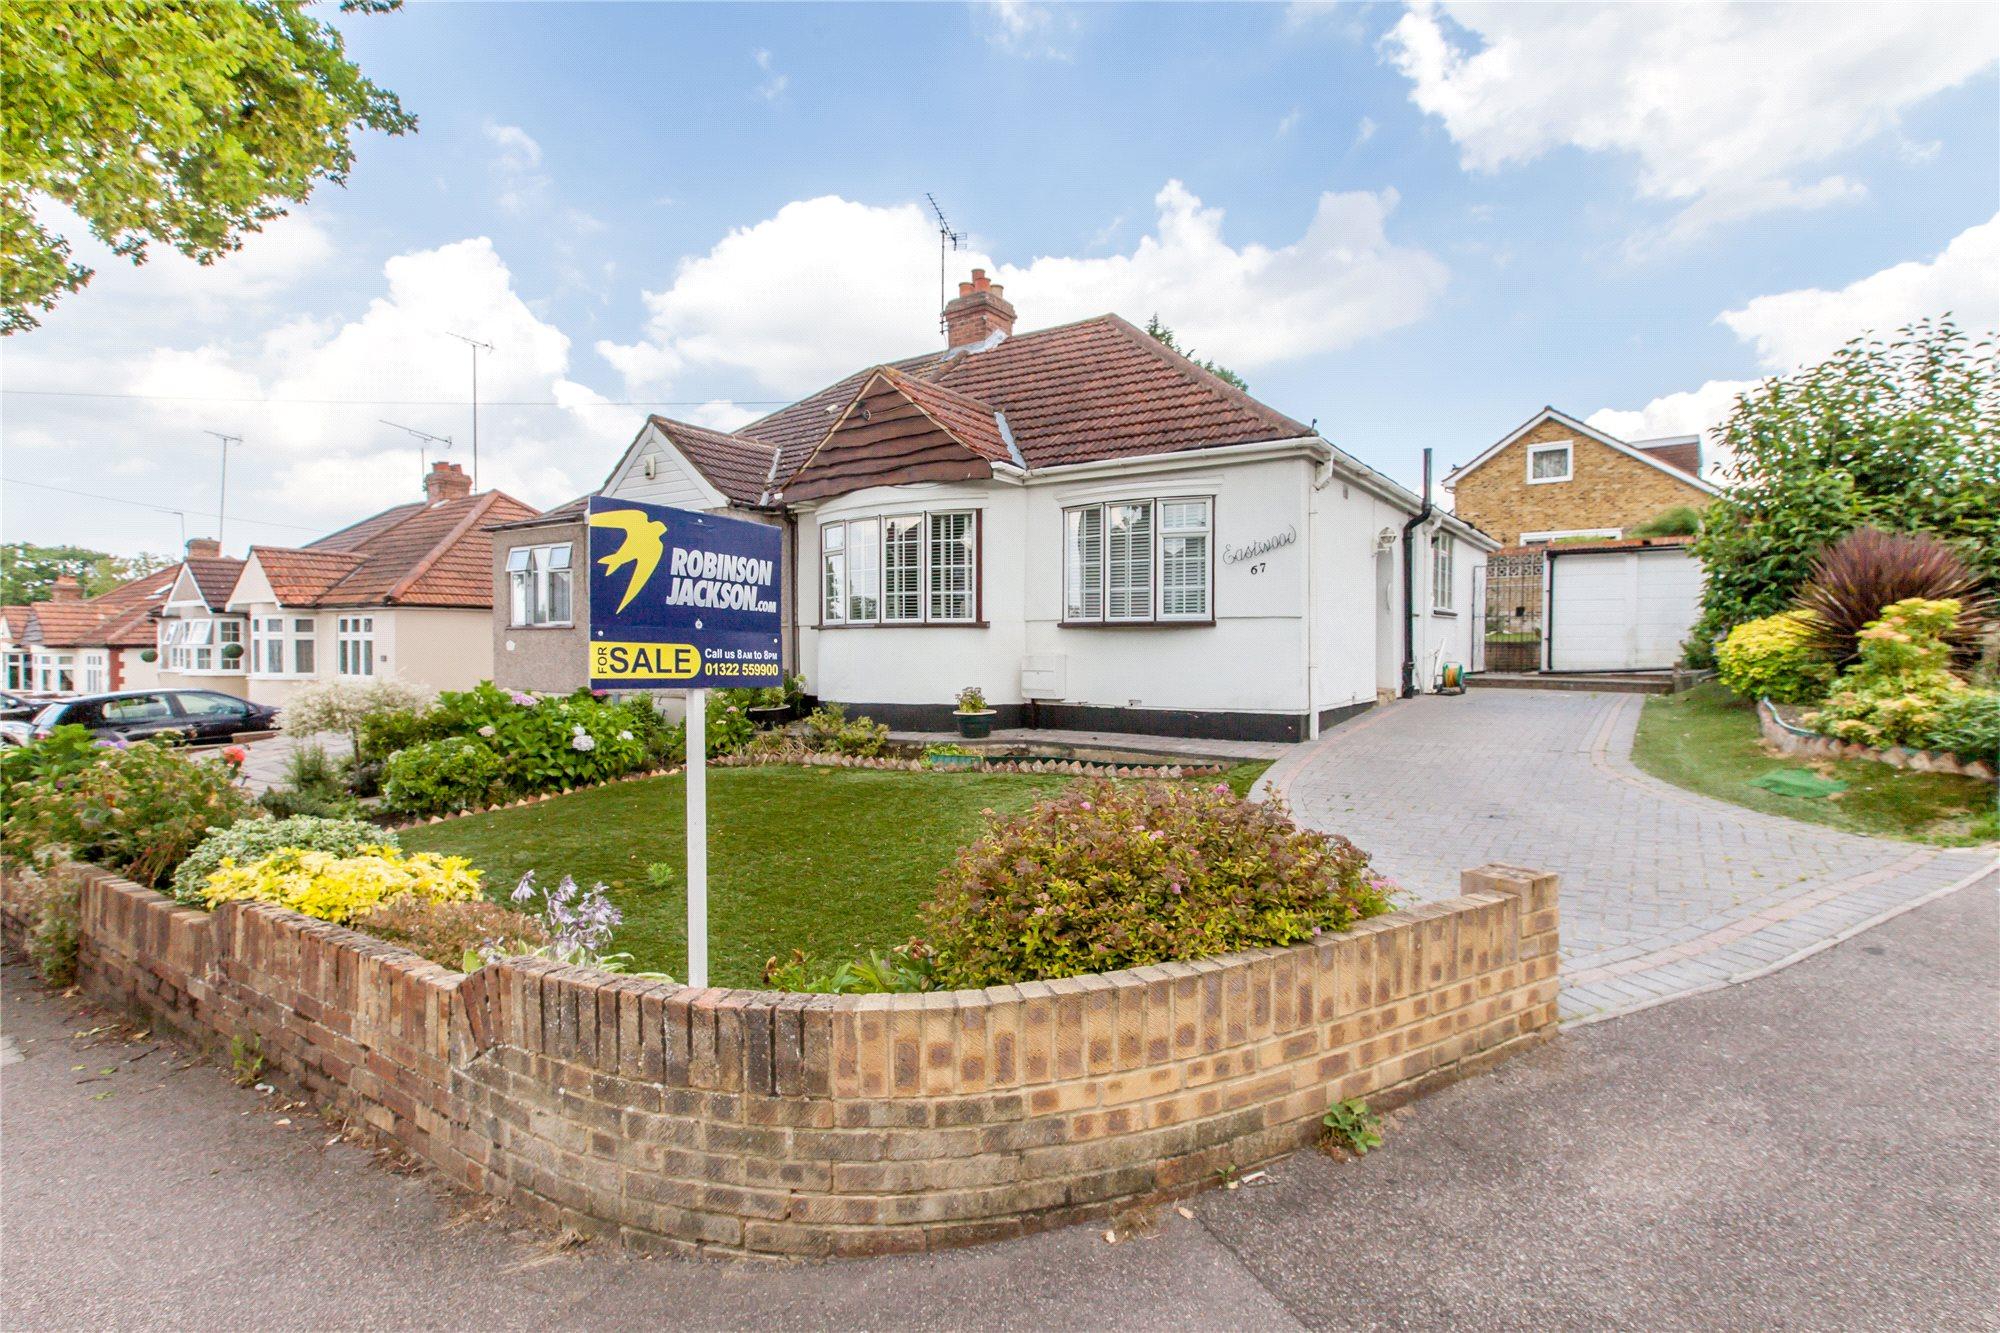 Summerhouse Drive, Joydens Wood, Bexley, Kent, DA5